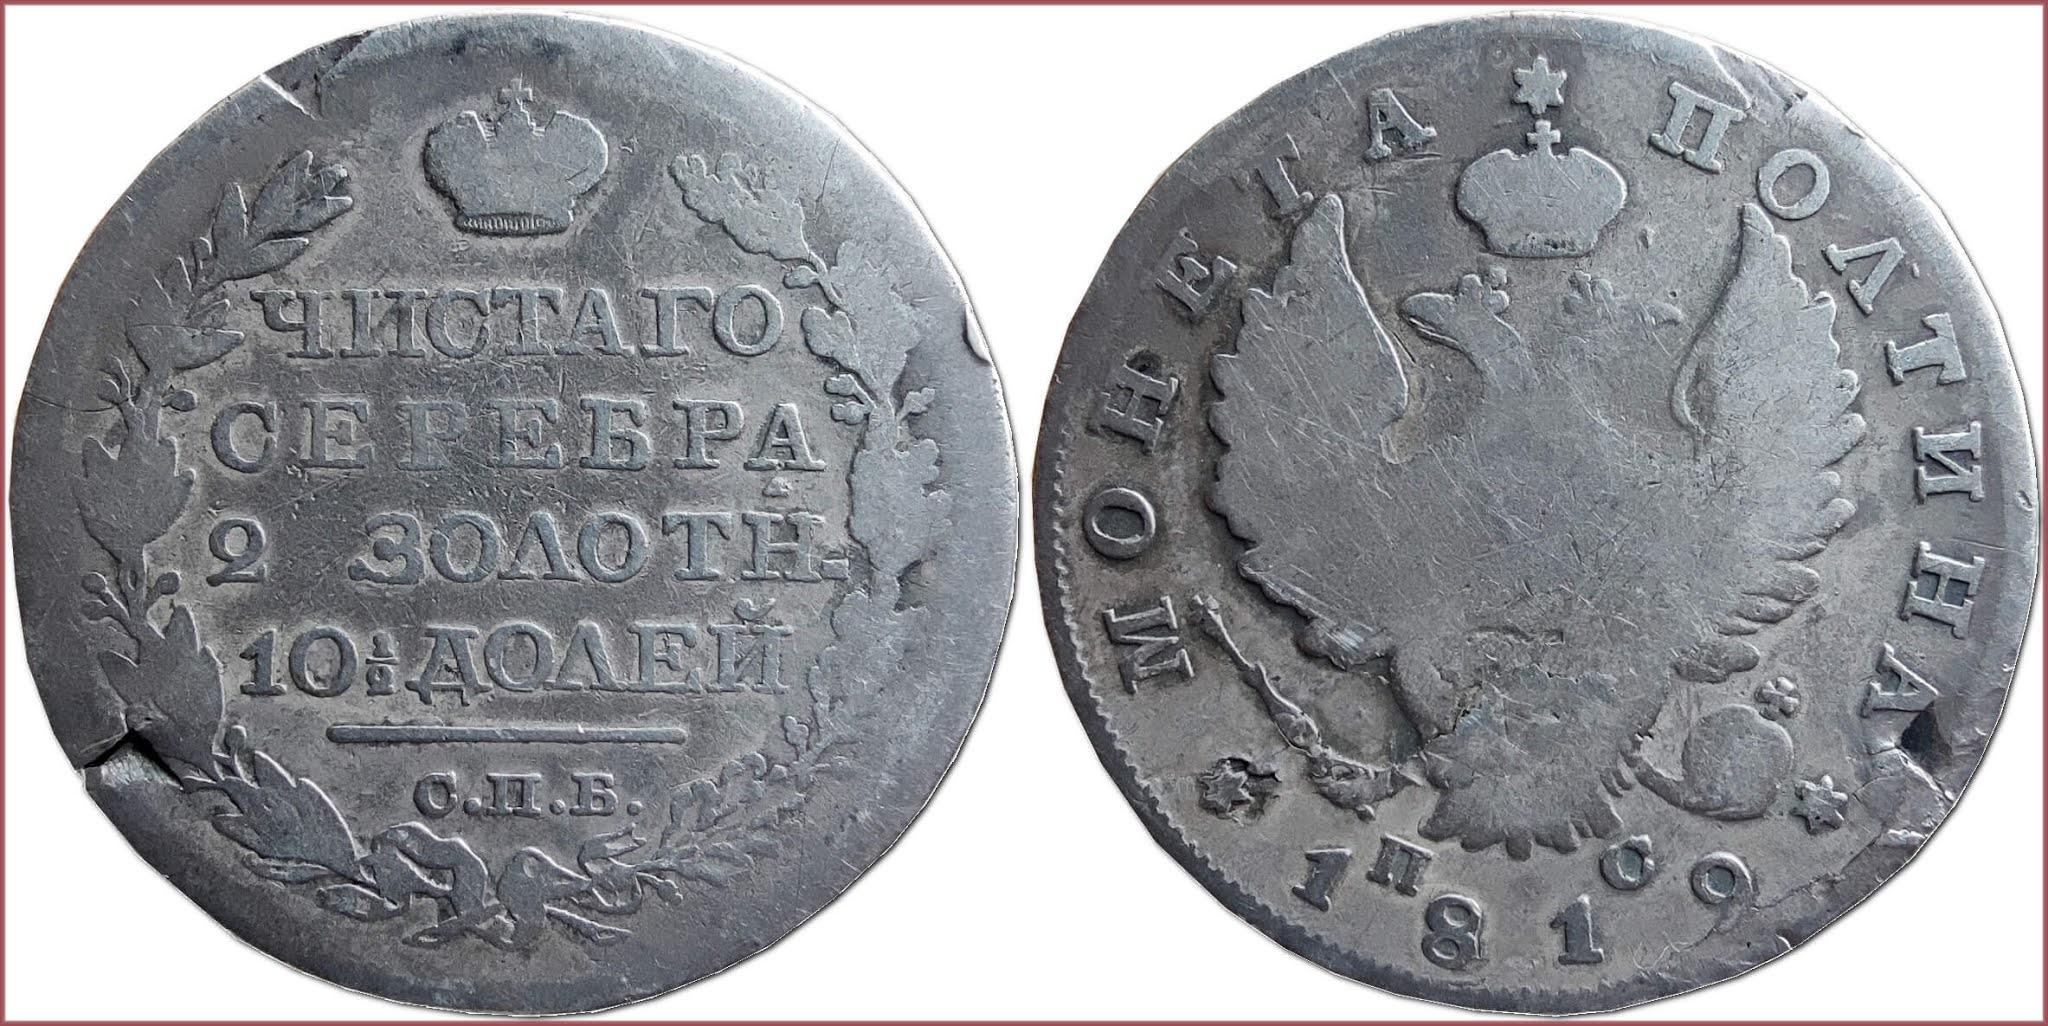 Poltina (Полтина), 1819: Russian Empire